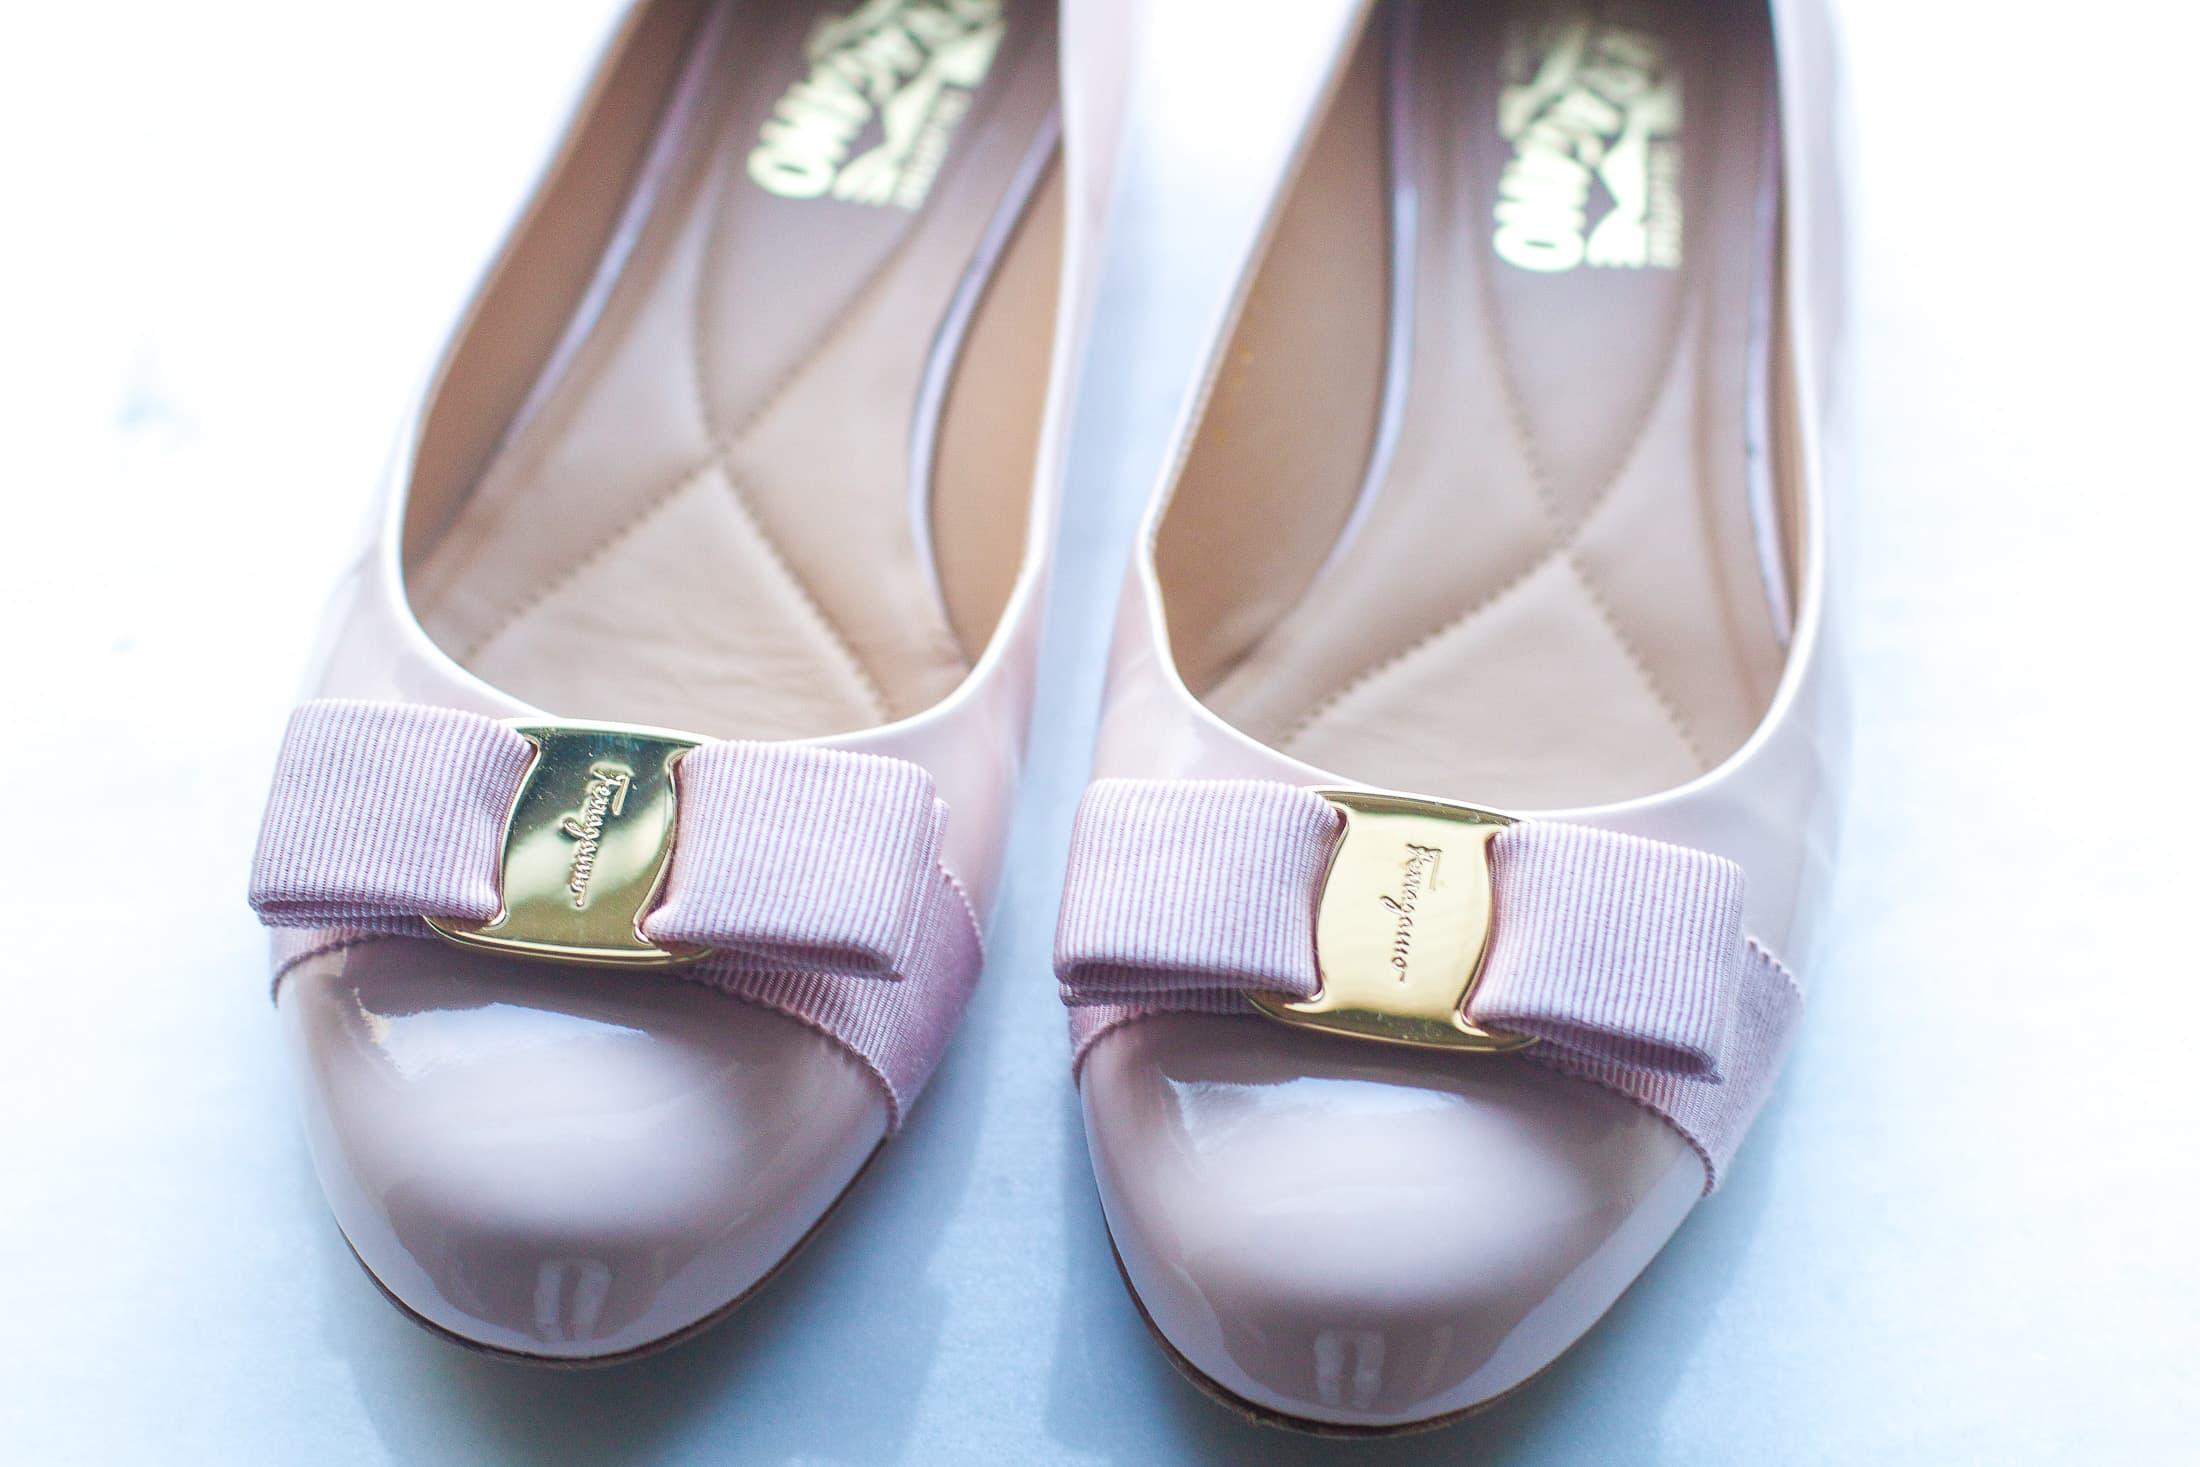 luisaviaroma shoes, salvatore ferragamo ballerina flats